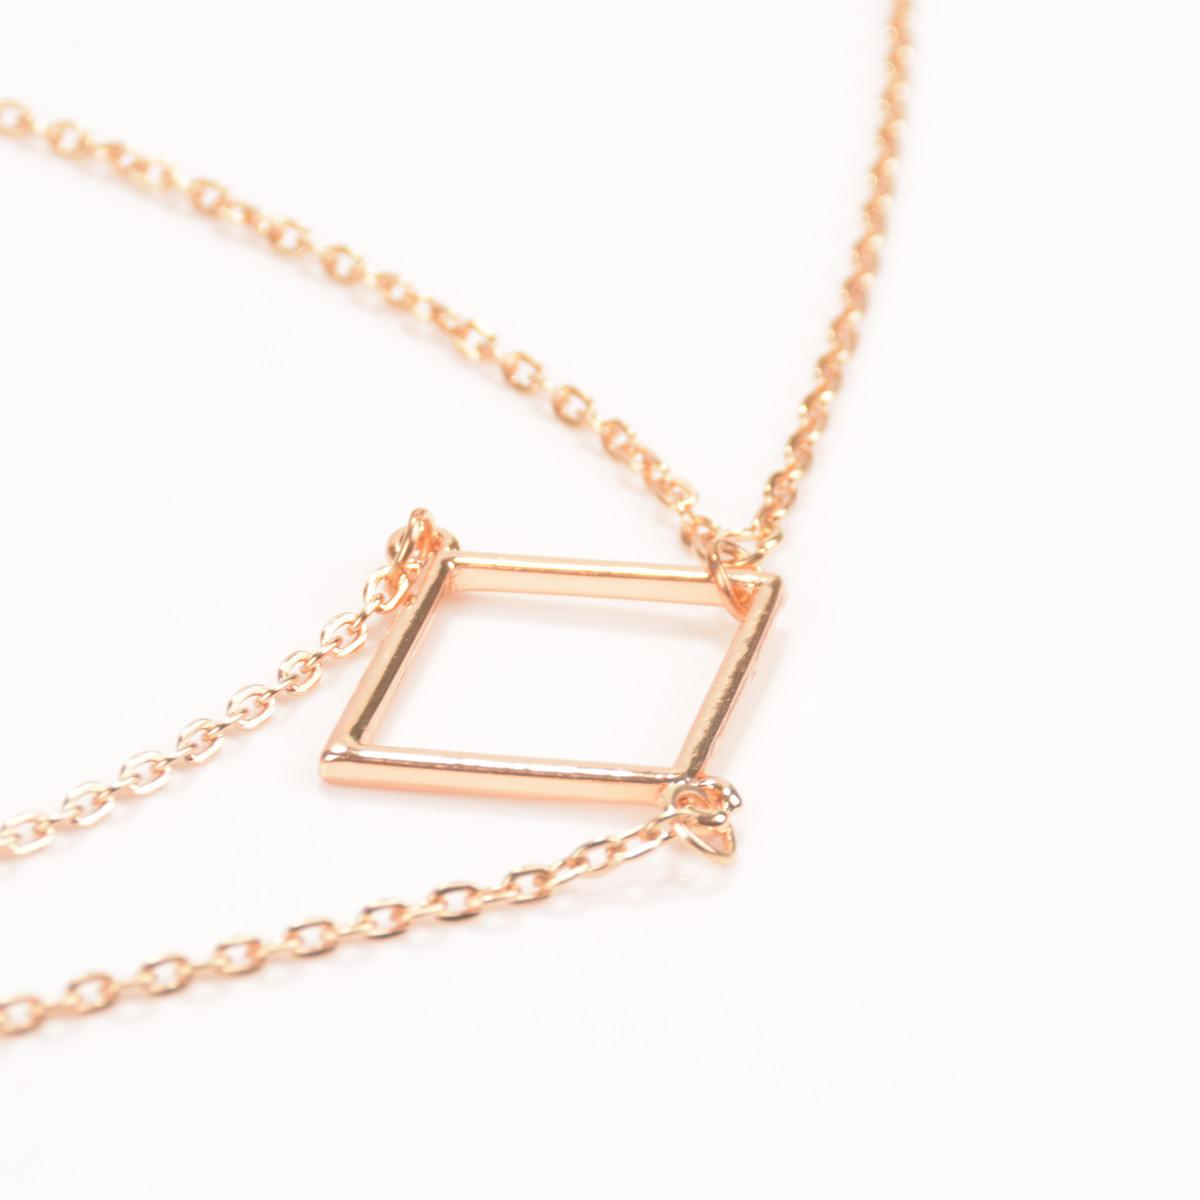 1960-68882f702a3c31a1b8bbd8a2a73b8a48 Captivating Body Chain Necklace With Bijoux Triangle Turquoise Stone